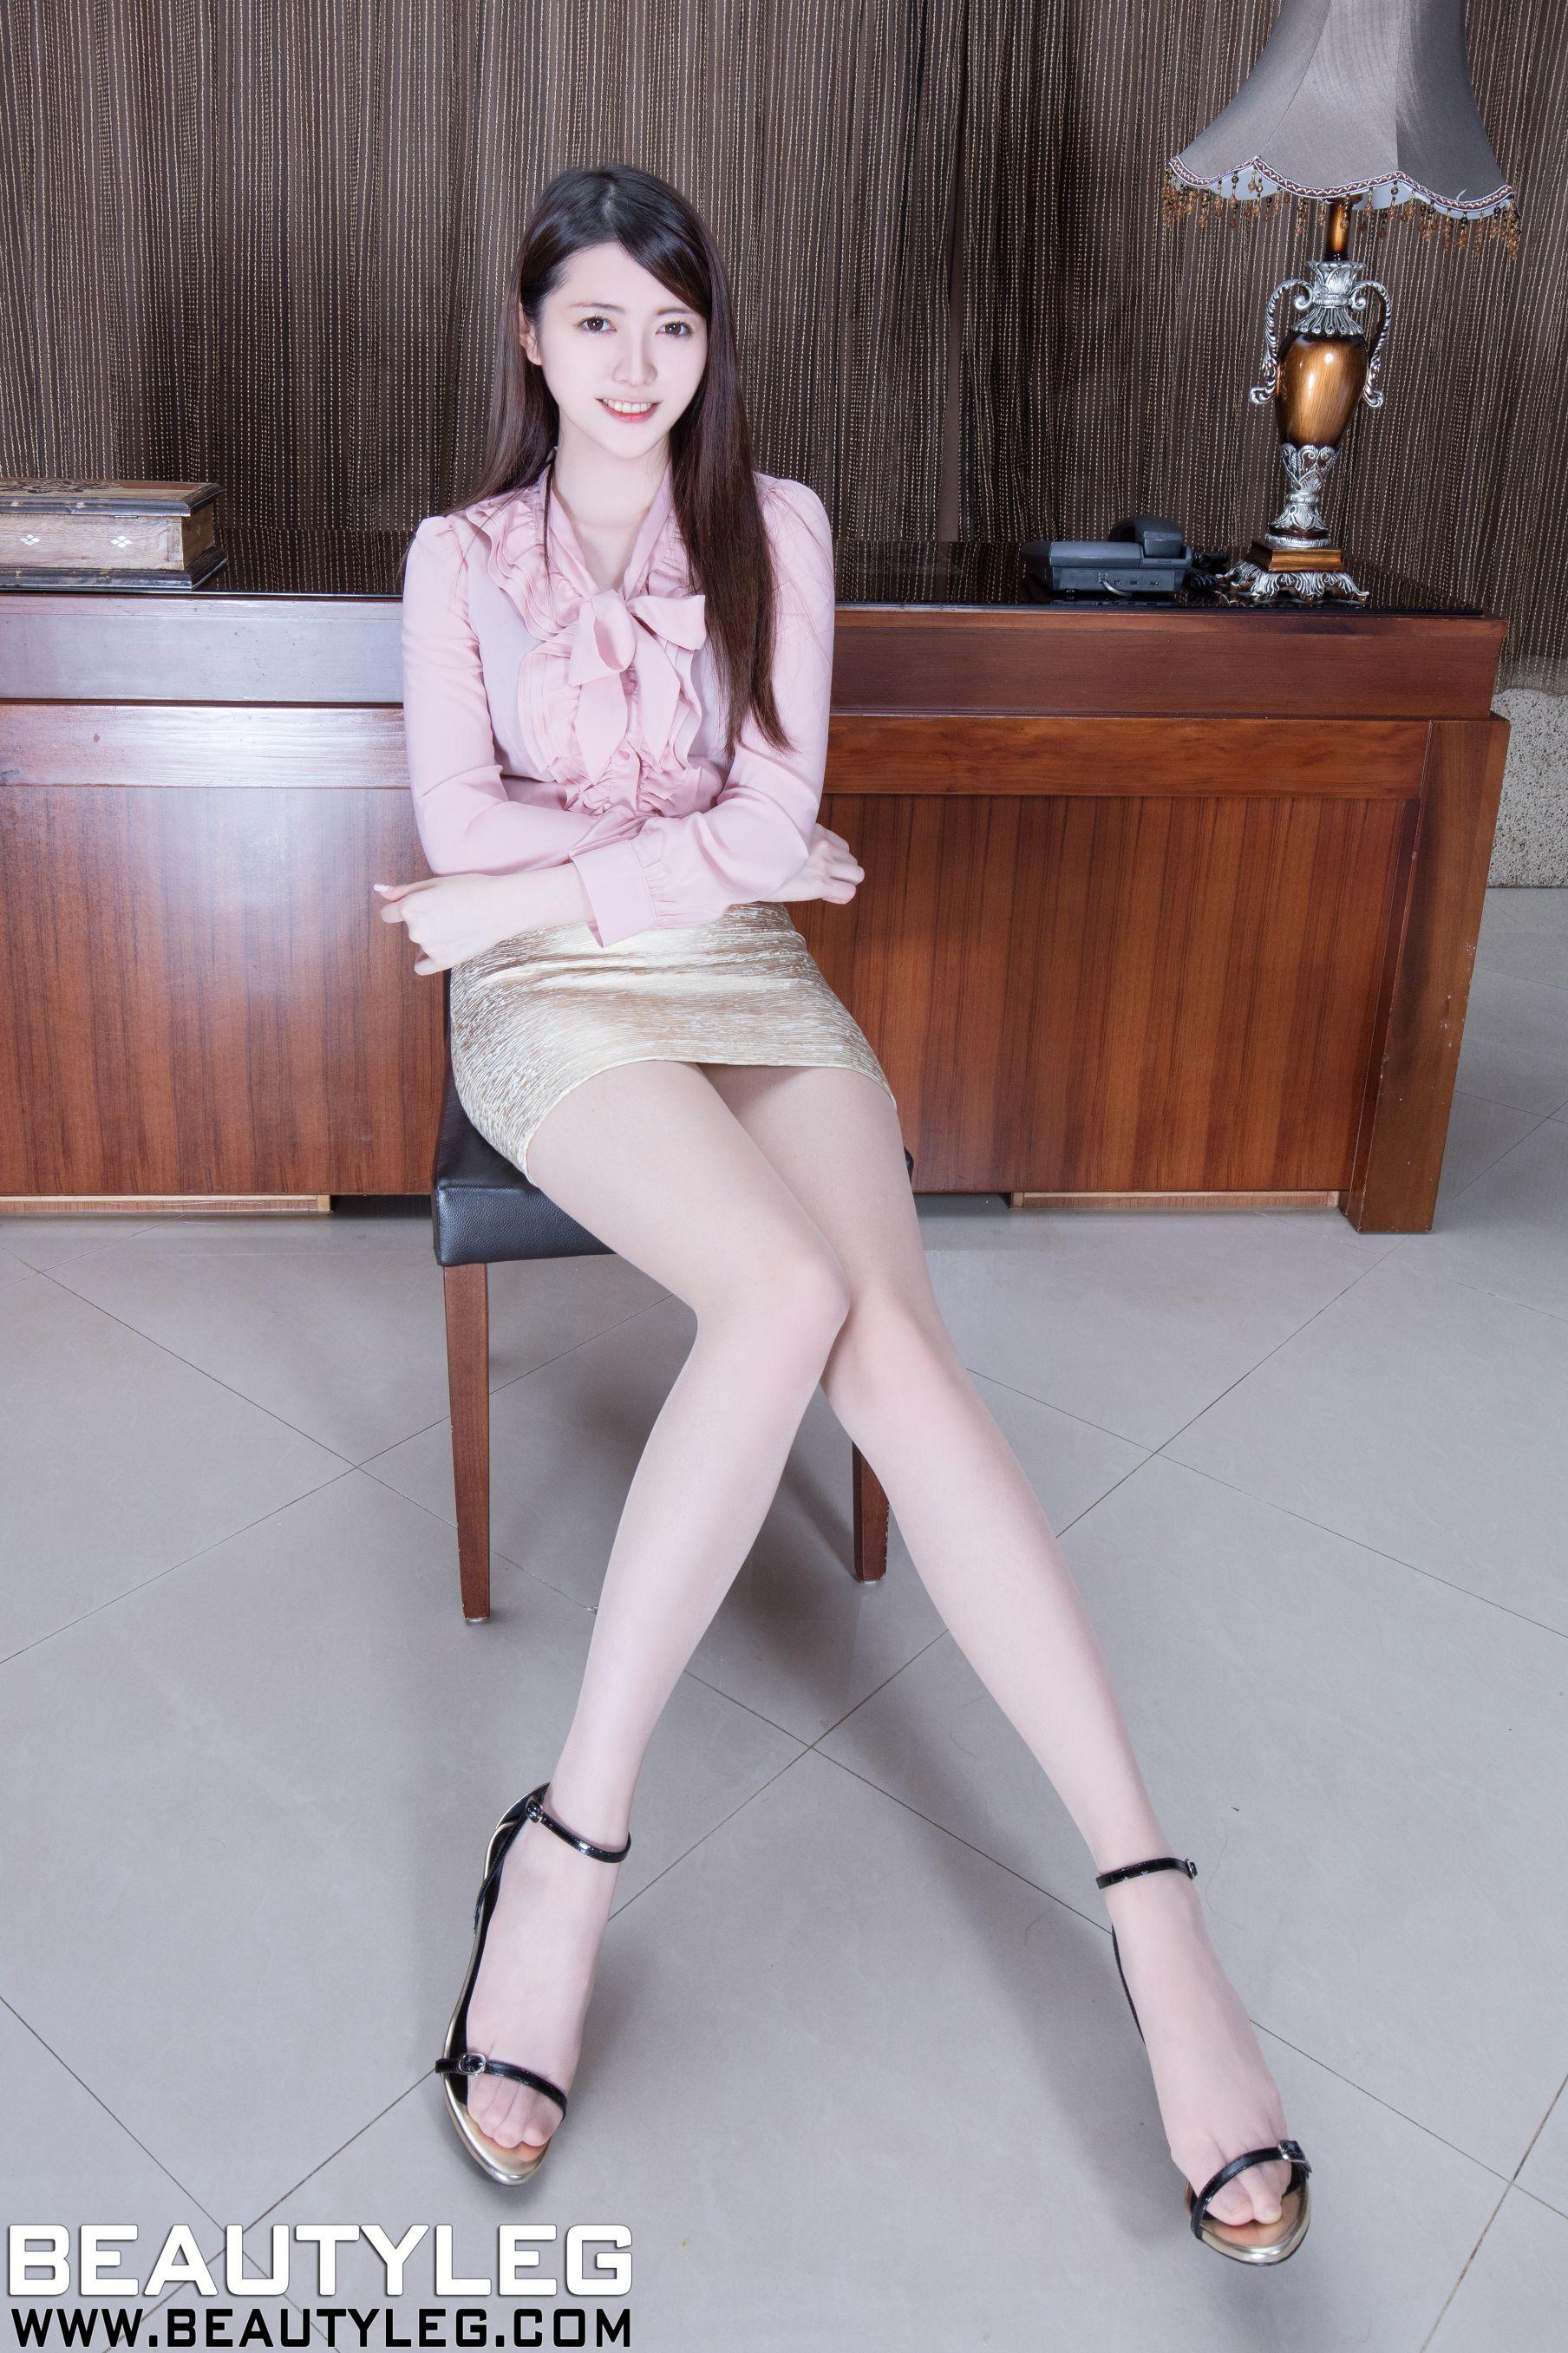 VOL.934 [Beautyleg]丝袜美腿长腿美女:黄品瑄(腿模Brindy)高品质写真套图(45P)